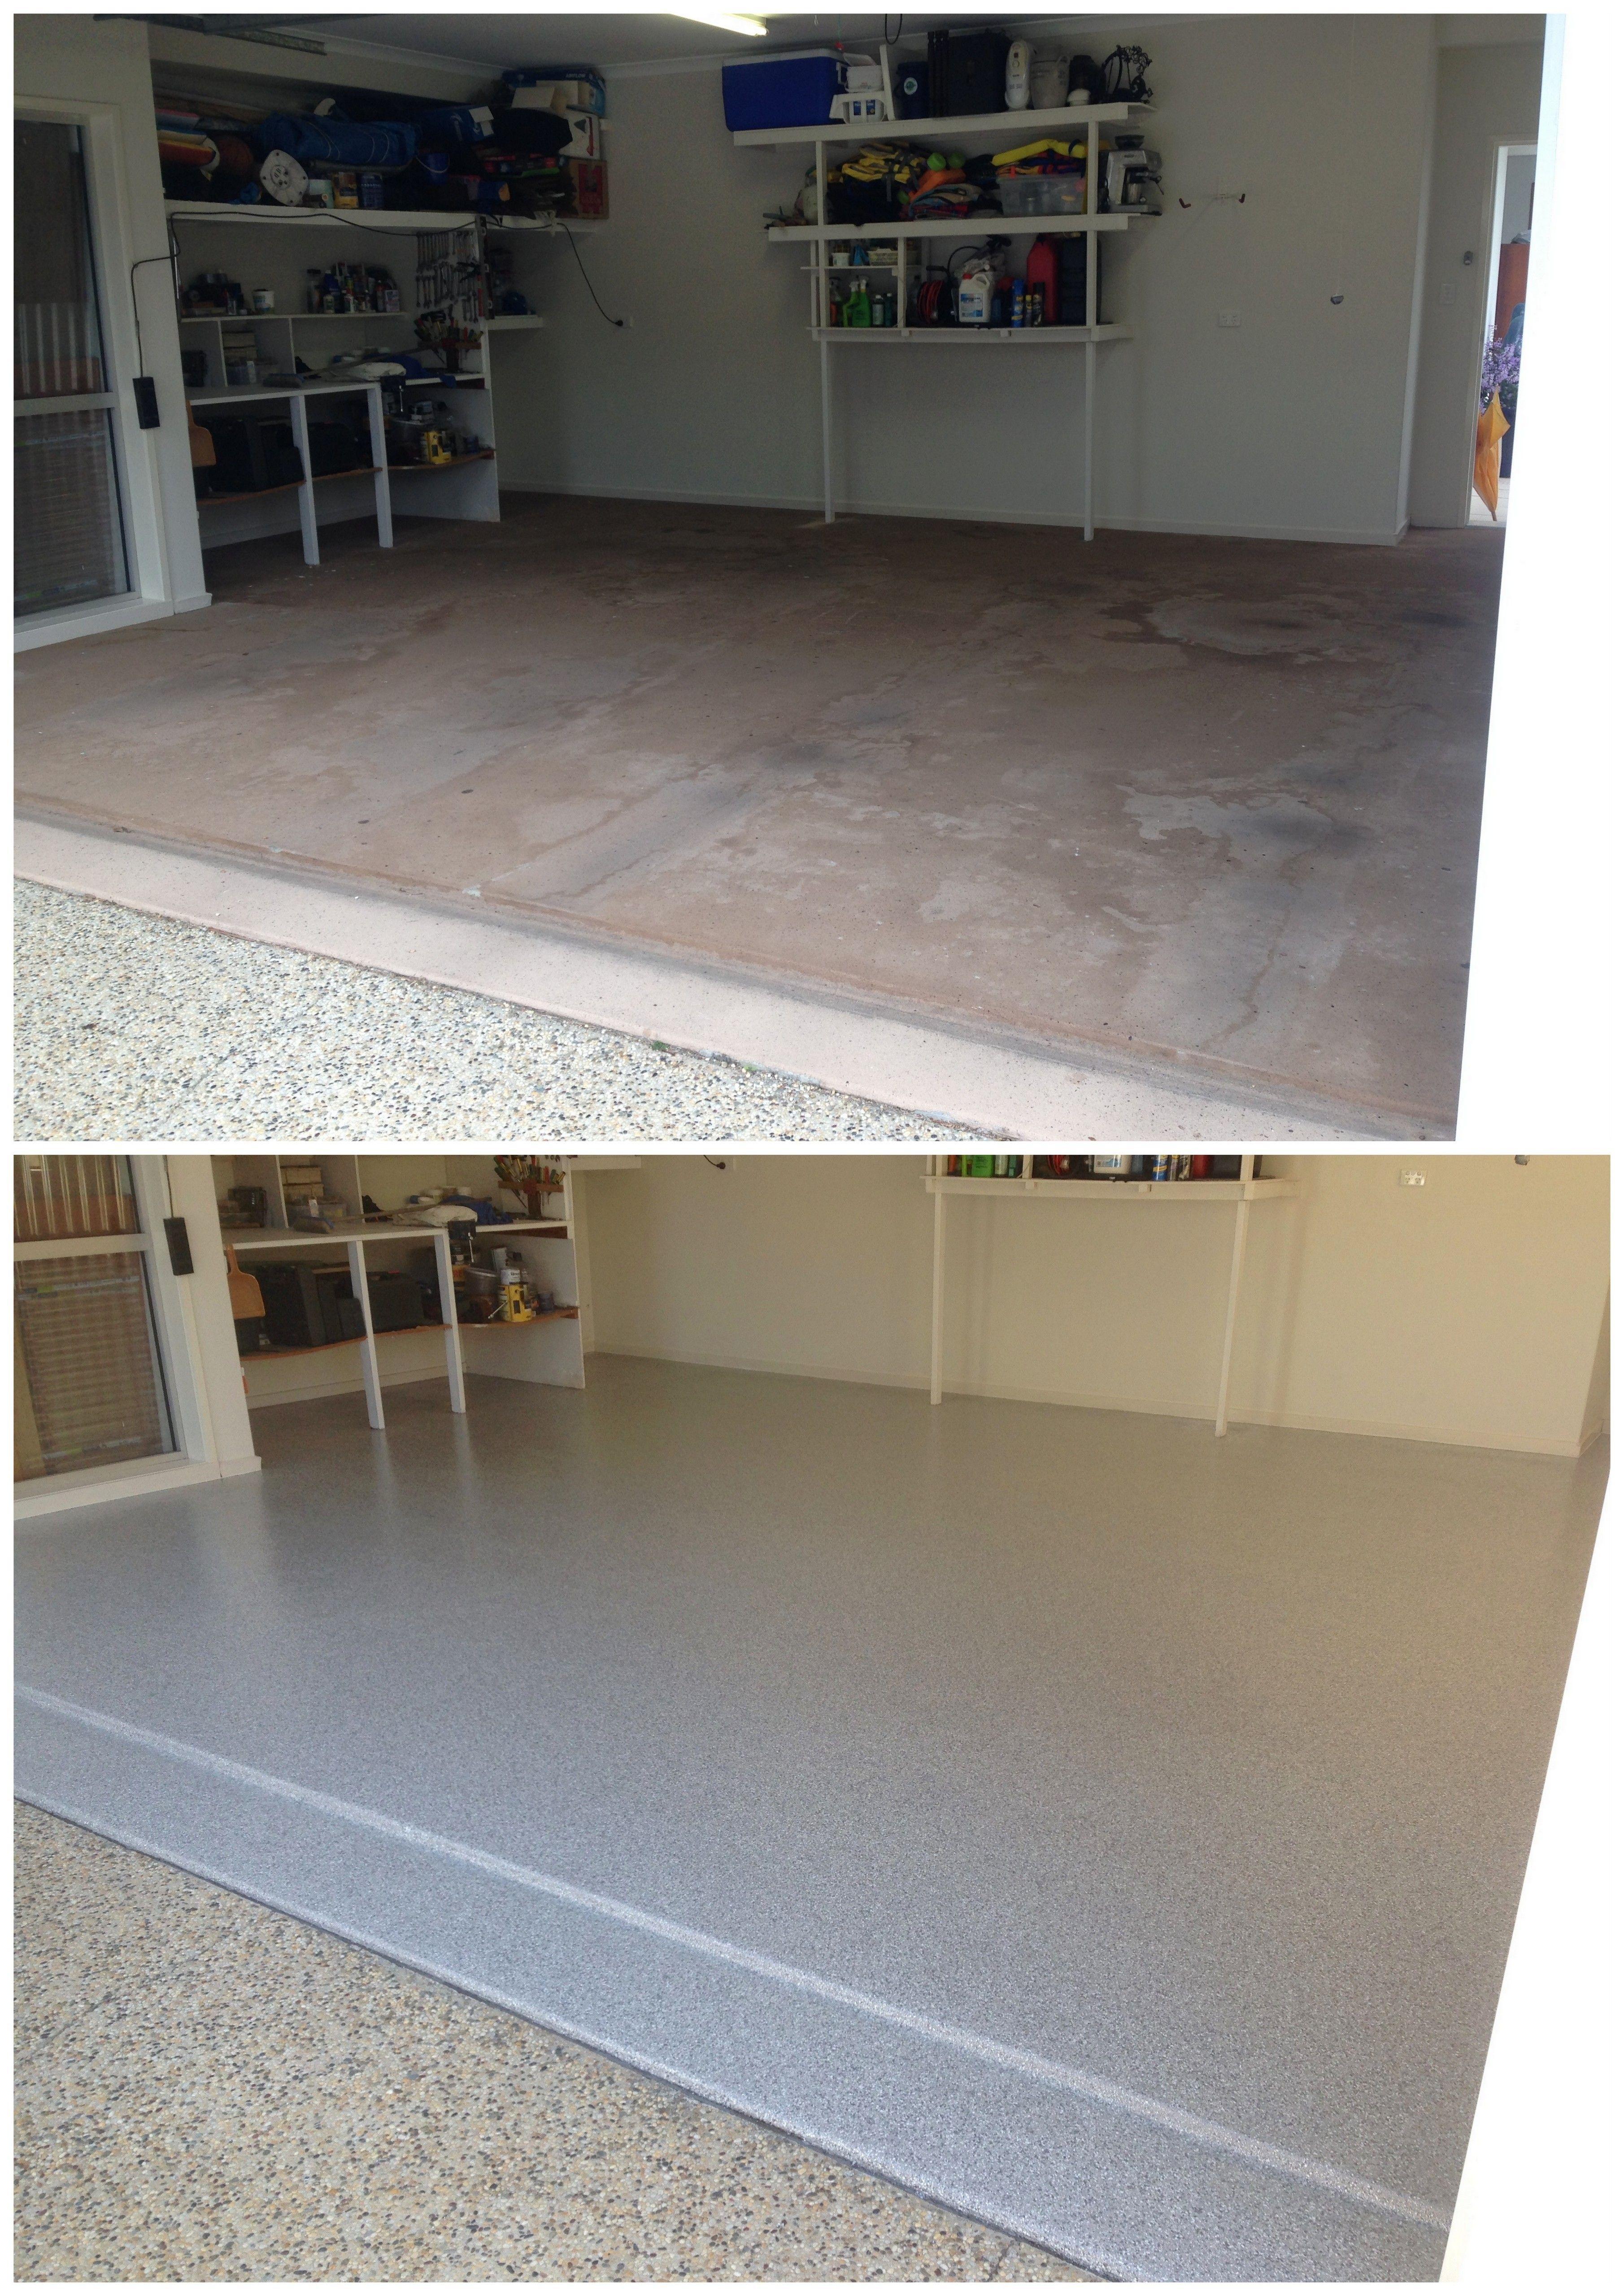 Epoxy Flooring Noosa Heads. Garage Floor Coatings that